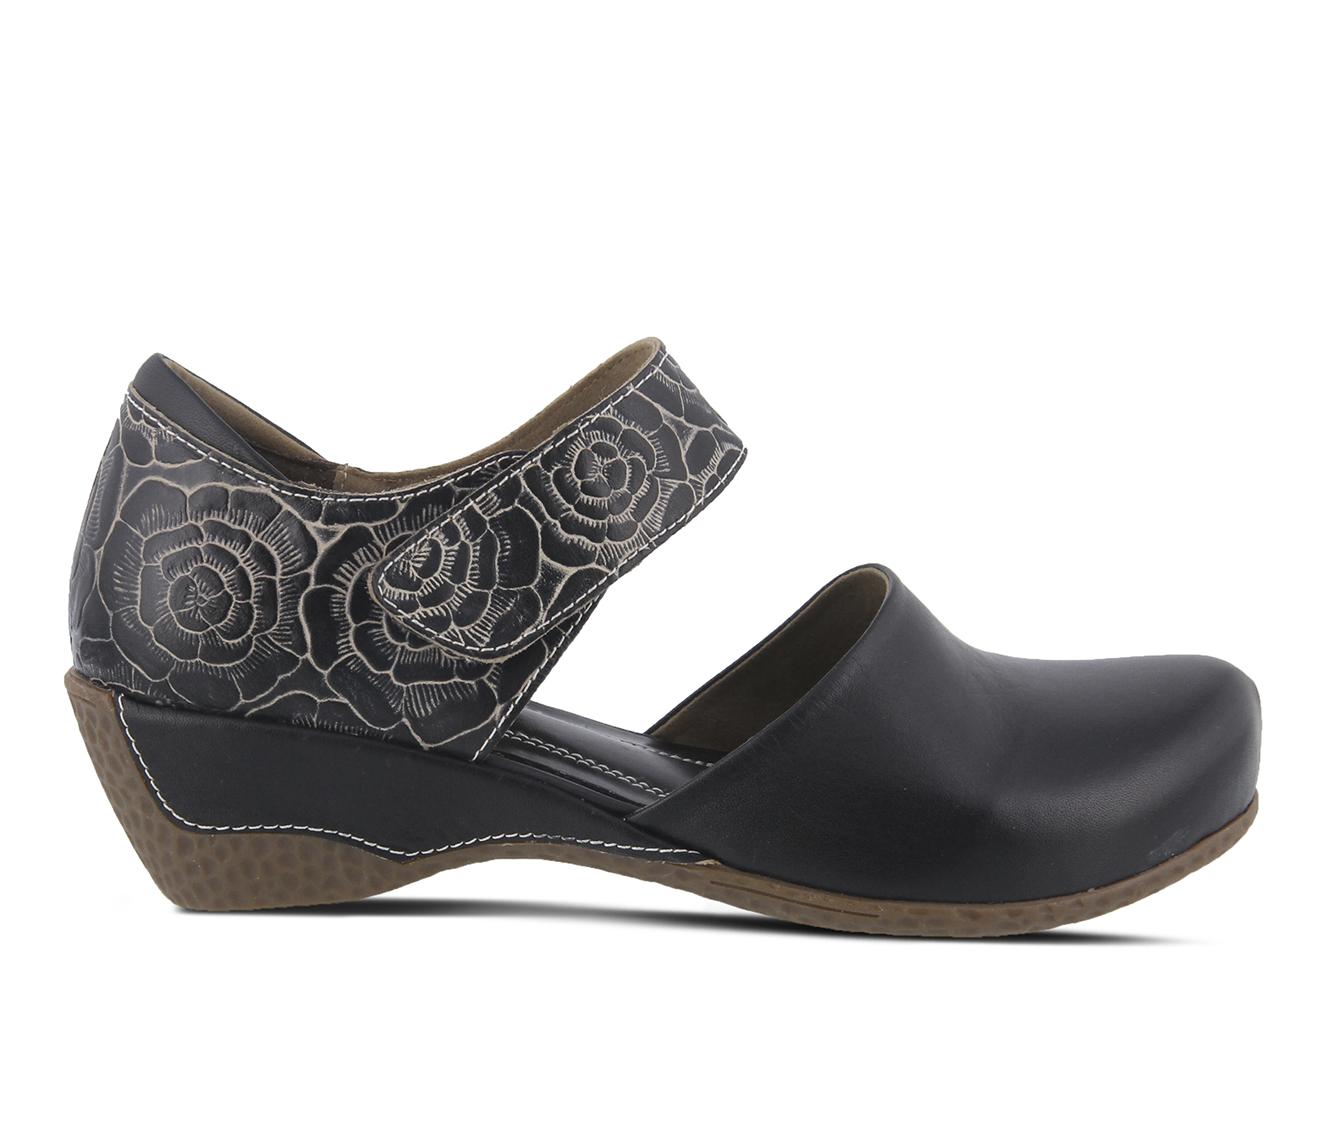 L'Artiste Gloss-Pansy Women's Shoe (Black Leather)